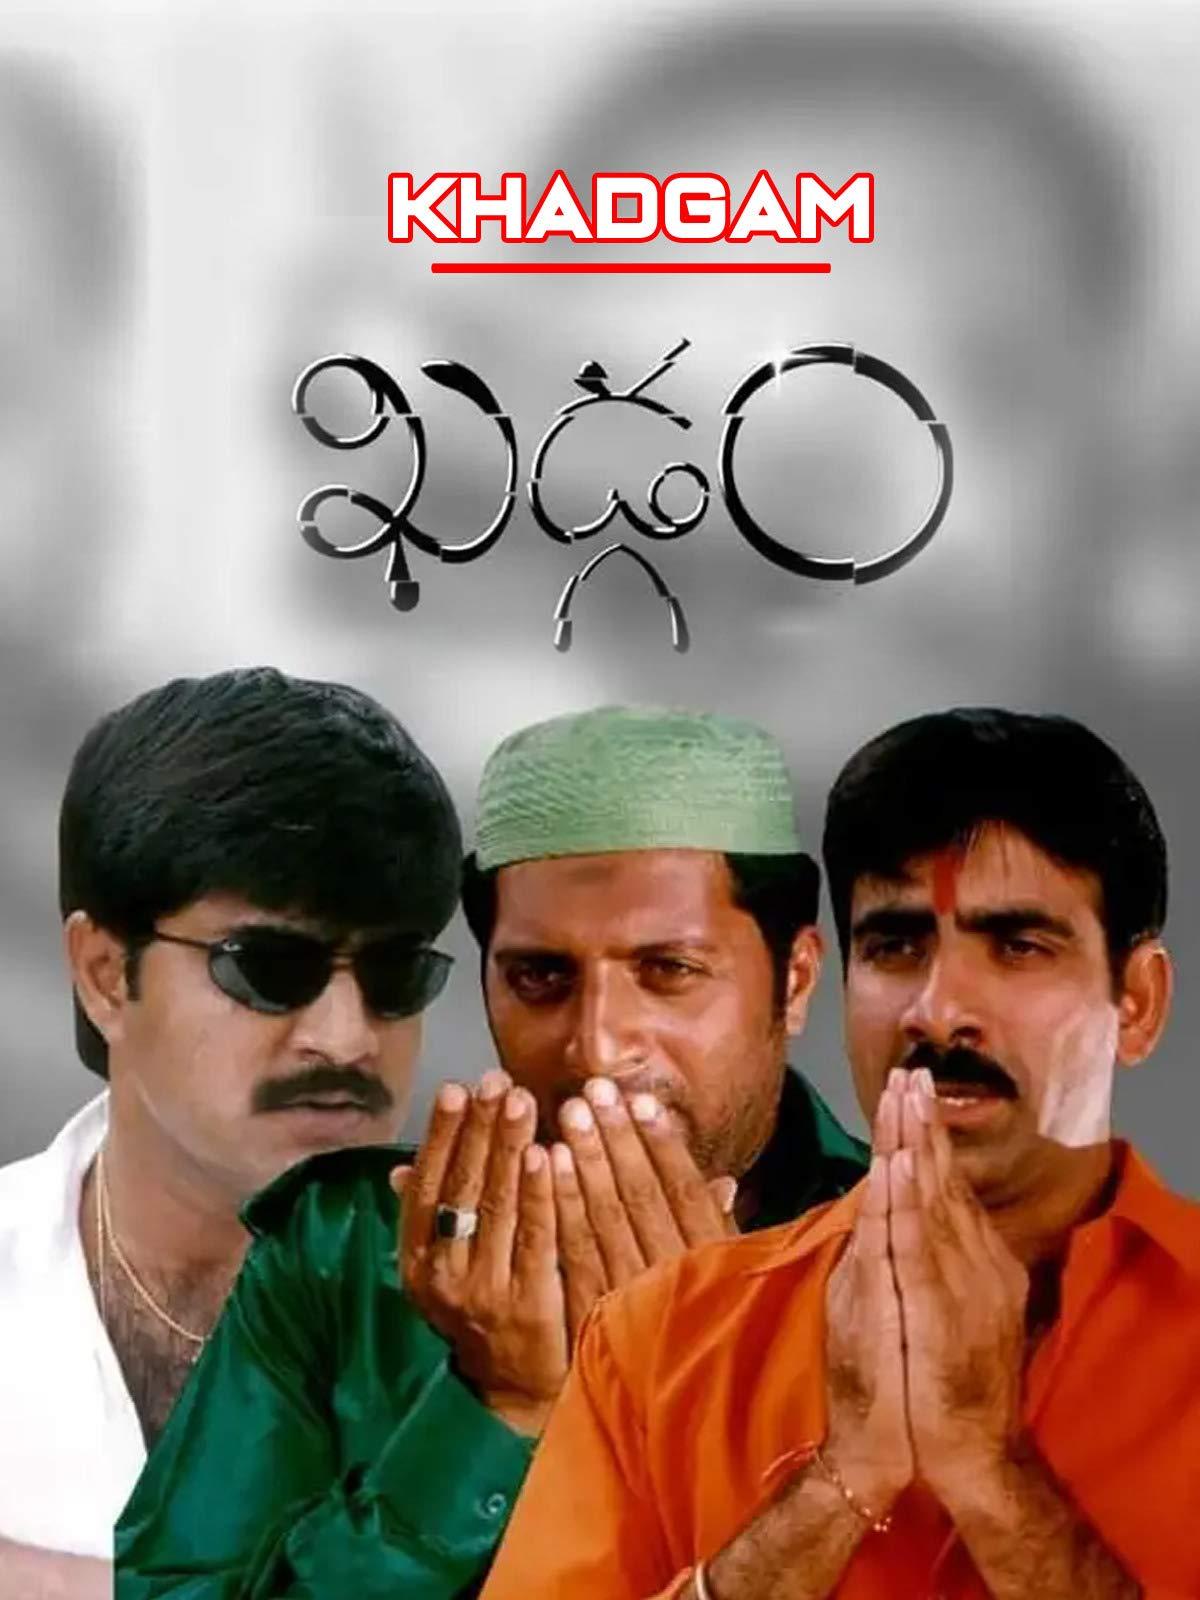 Khadgam